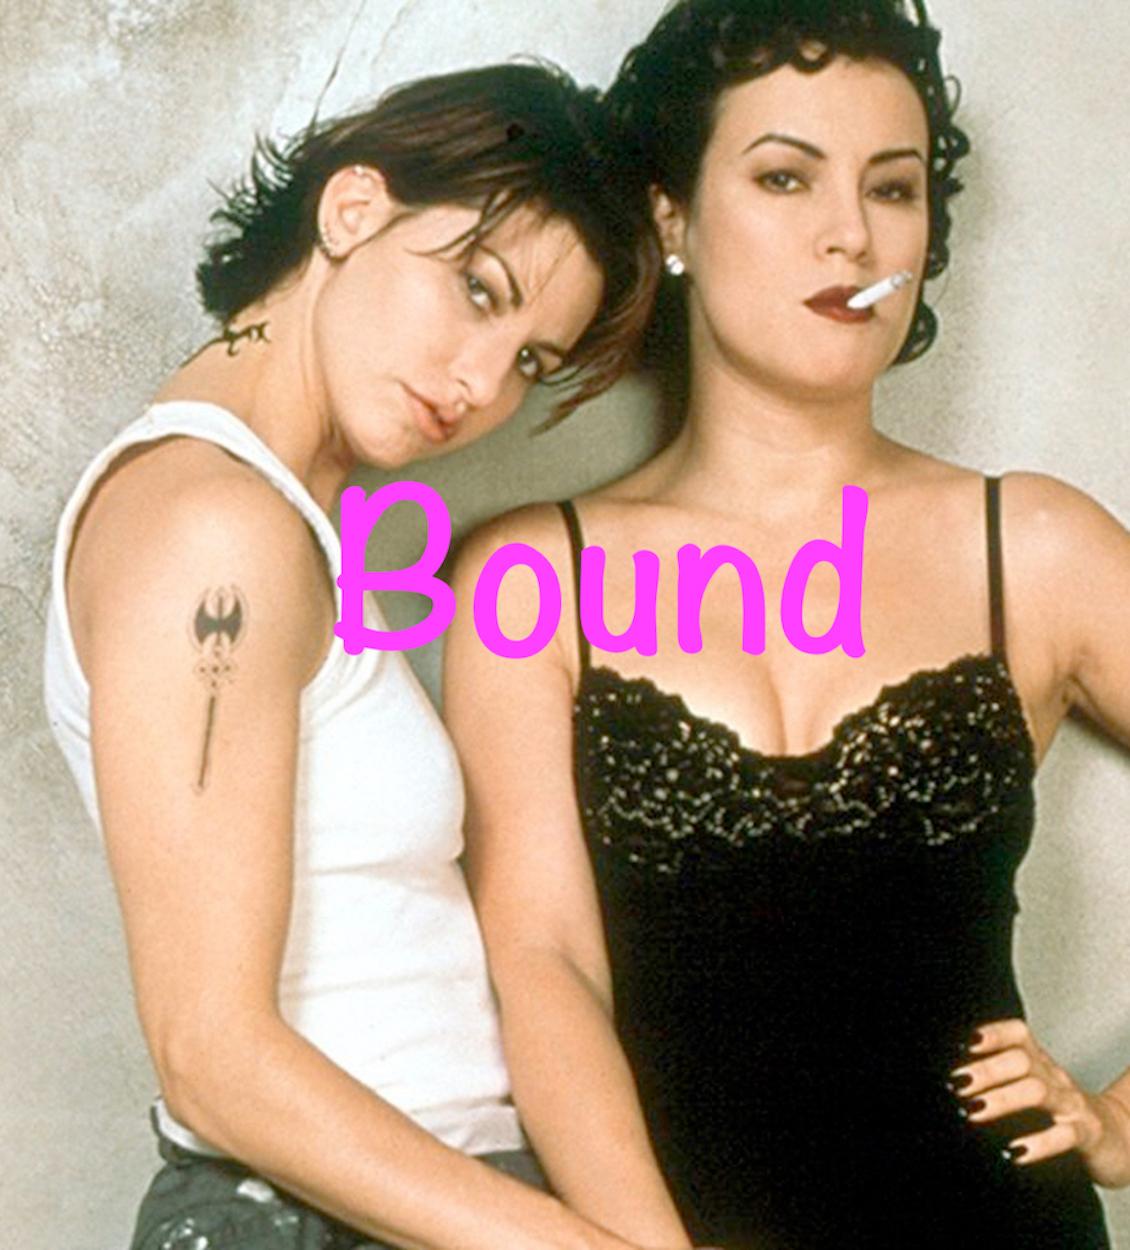 Bound episode image